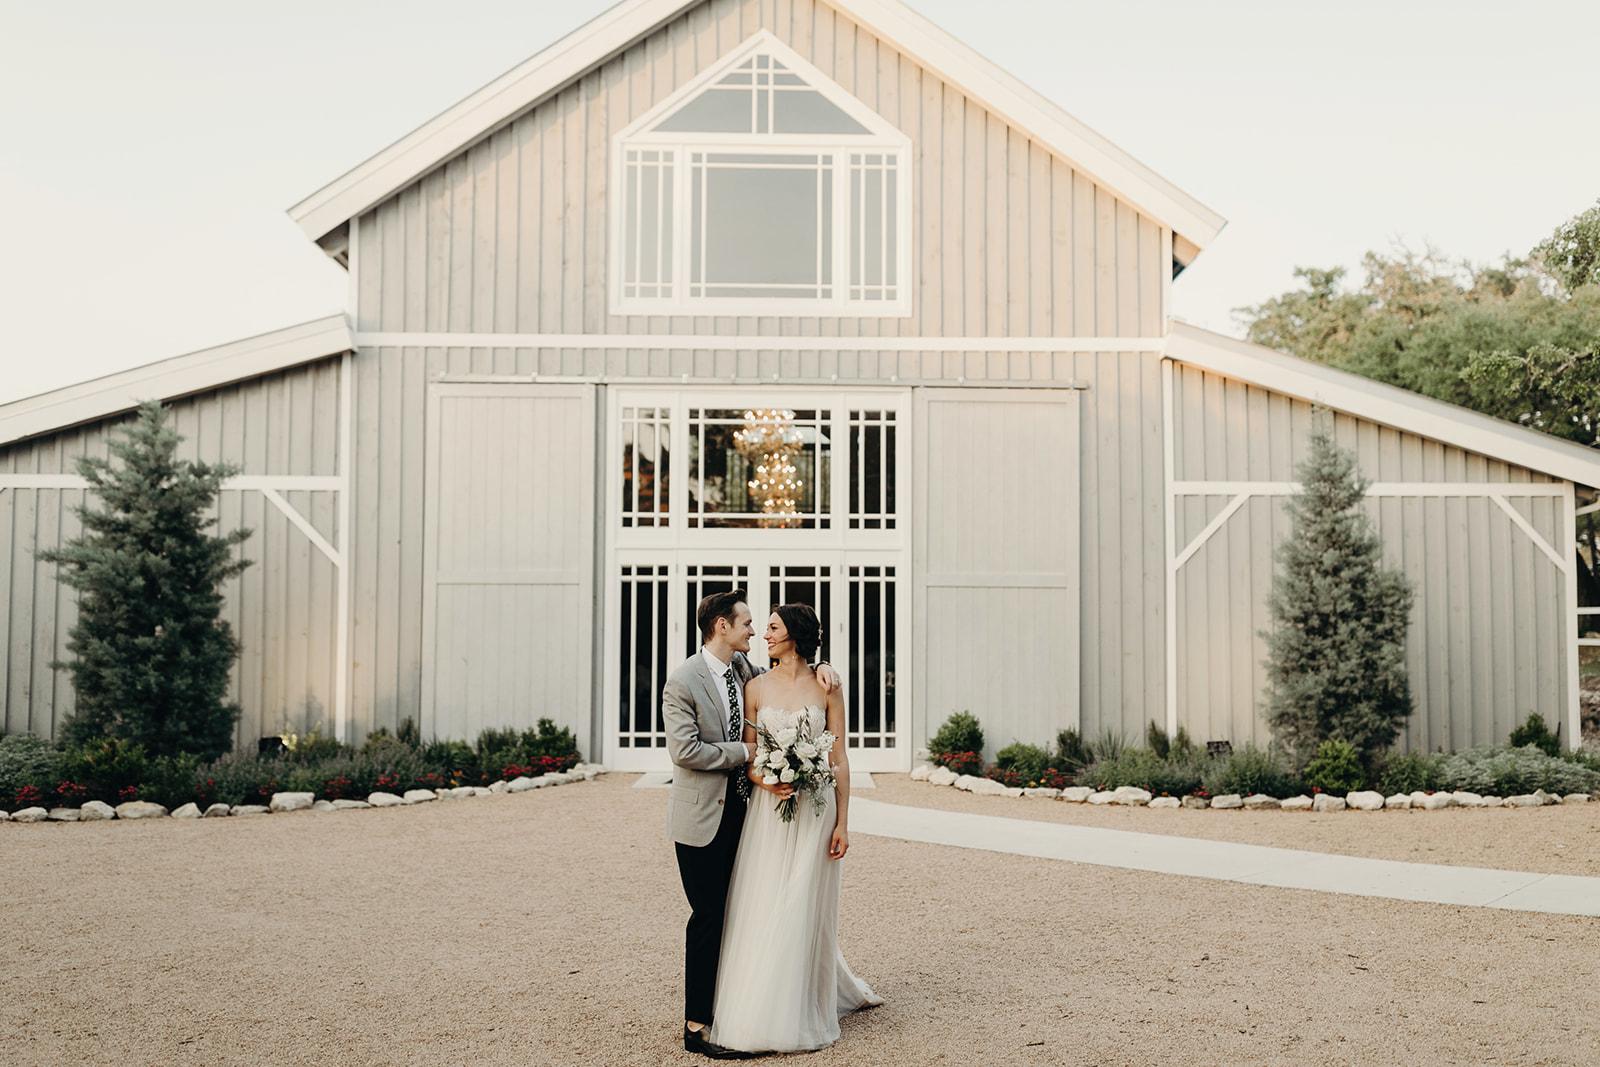 austin-wedding-lindsey-bryce-565.jpg